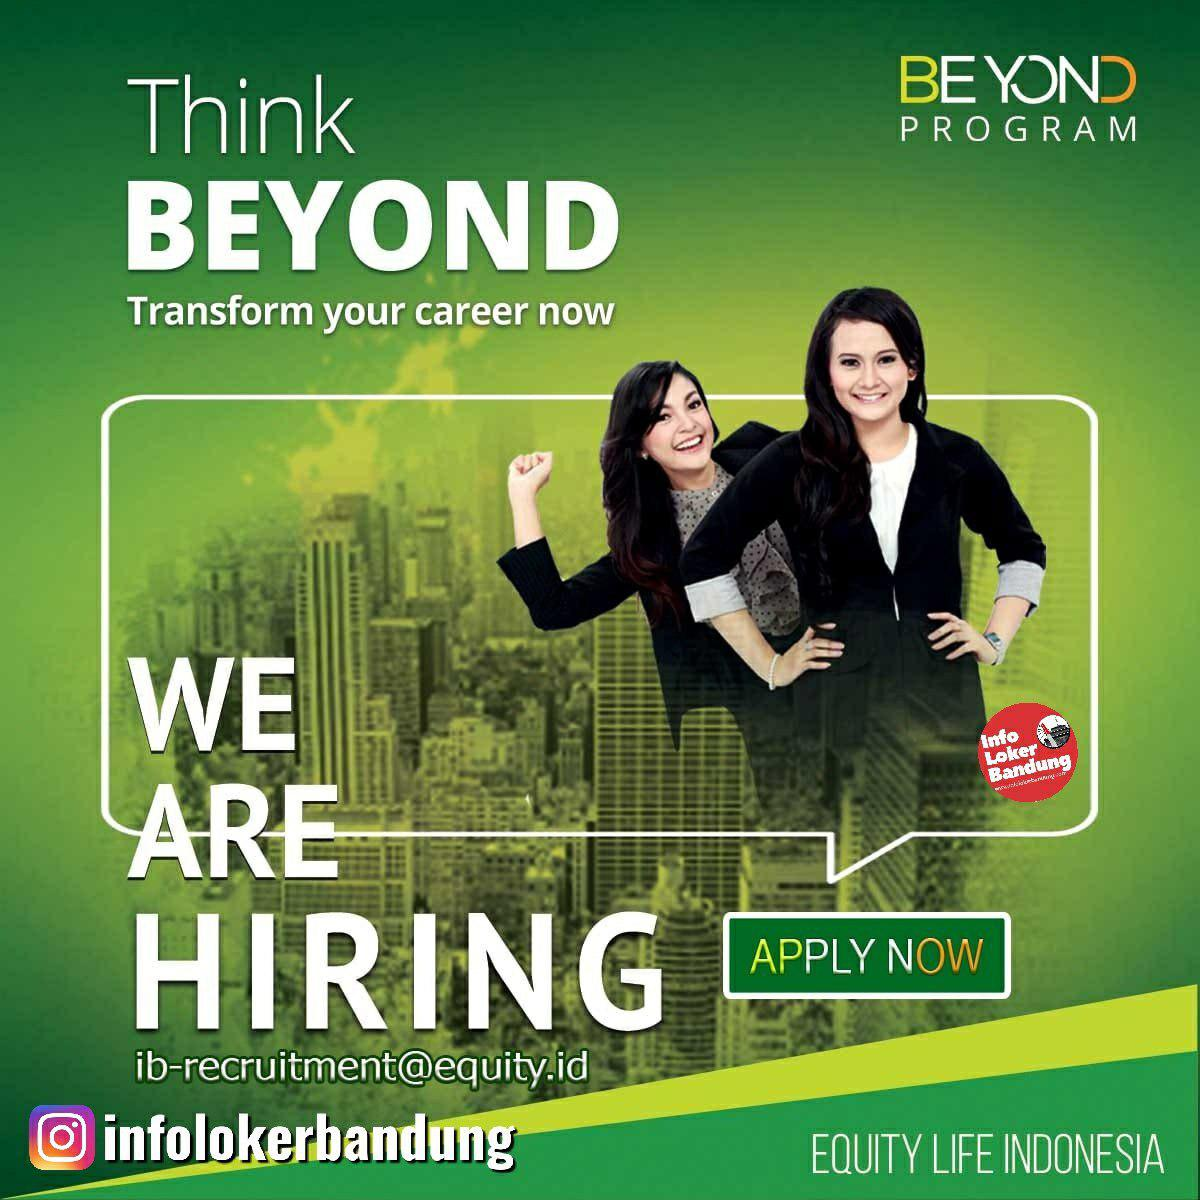 Lowongana Kerja PT. Equity Life Indonesia Bandung April 2019